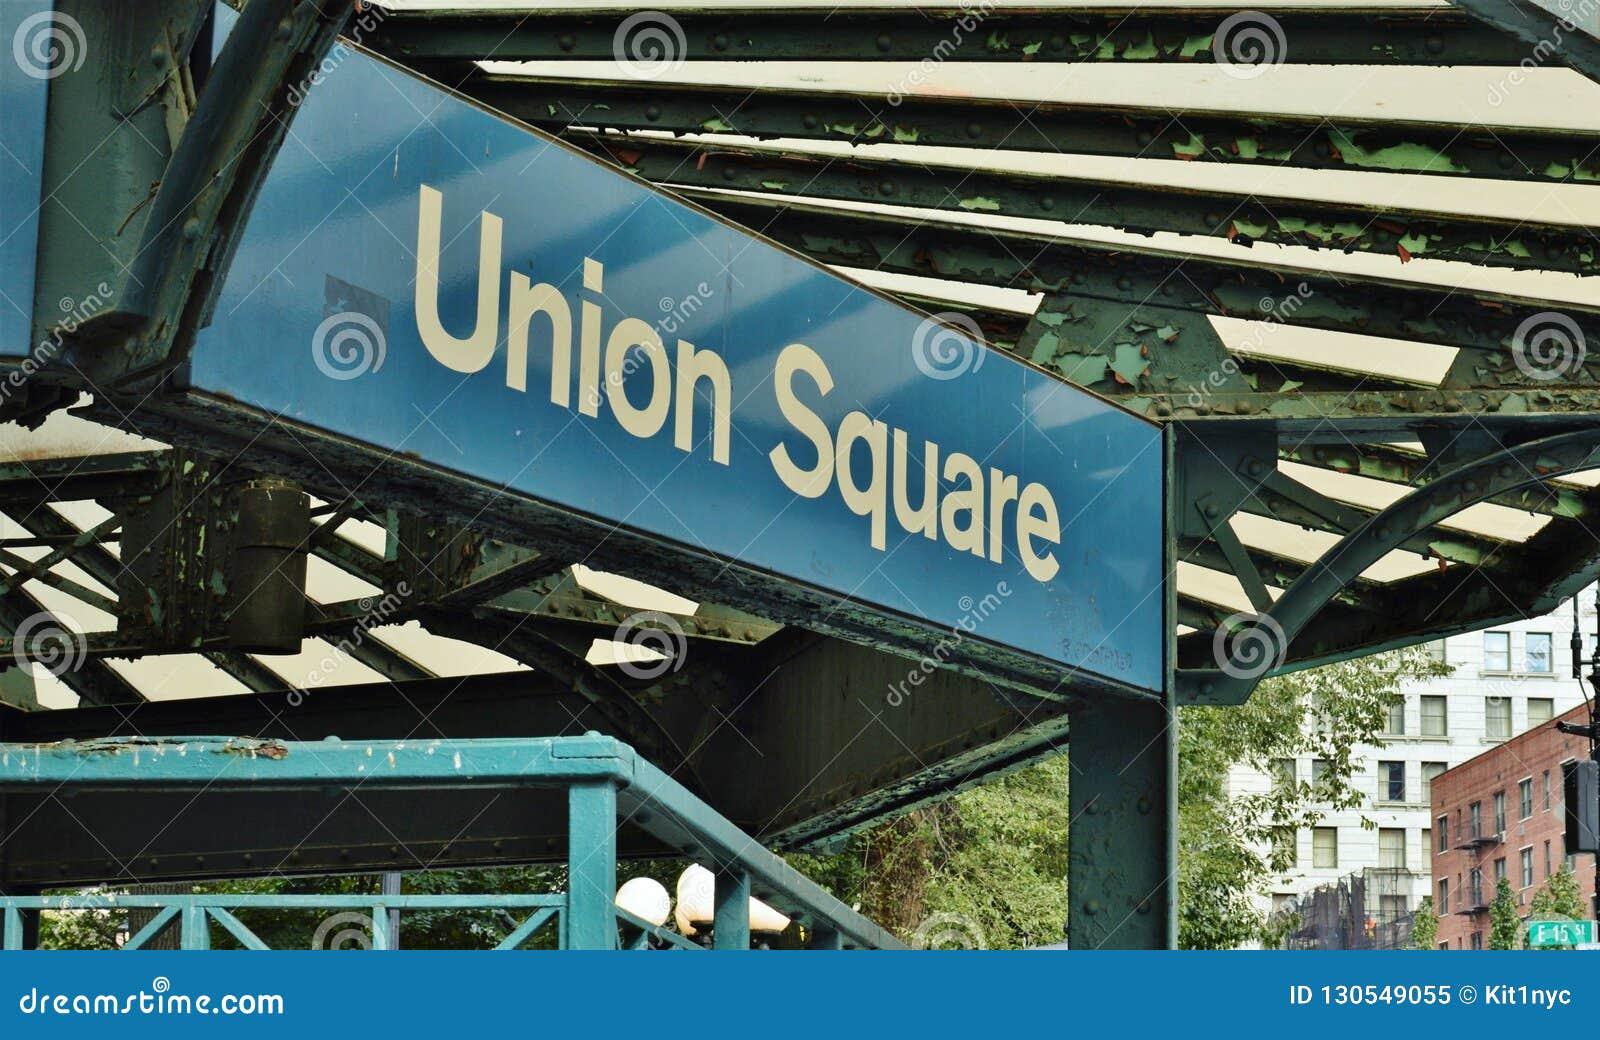 Union Square NYC Sign New York City Streets Manhattan Subway Station